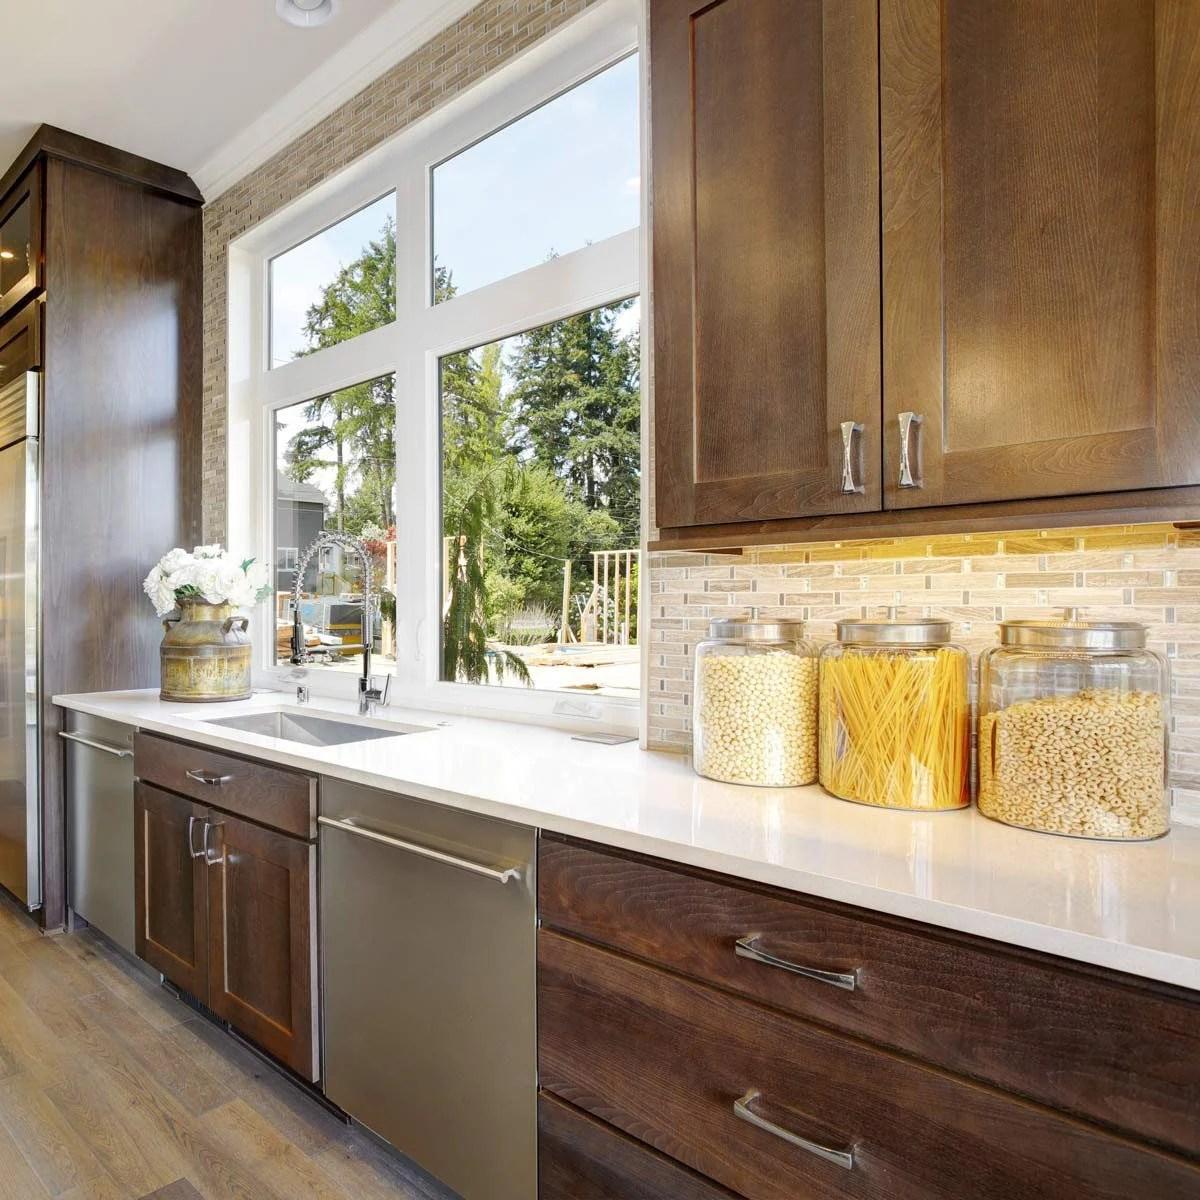 Best Kitchen Backsplash Ideas For Dark Cabinets | Family ... on Backsplash For Dark Countertops  id=82221